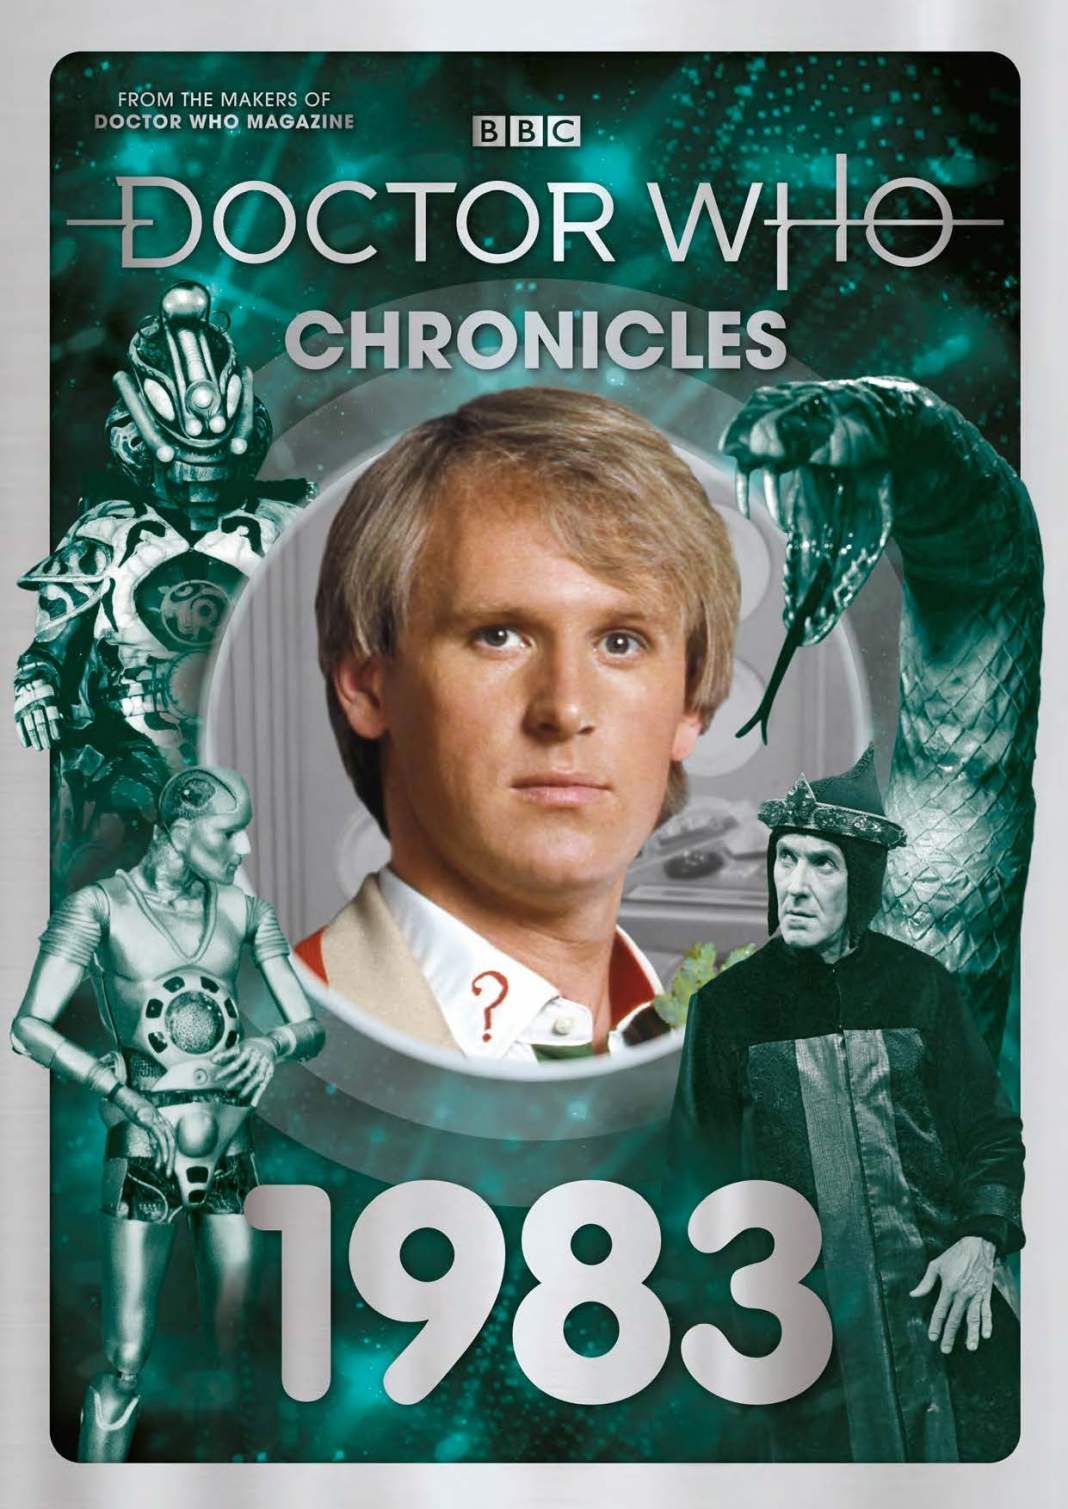 Doctor Who Chronicles: 1983 (c) Panini Doctor Who Magazine Fith Doctor Peter Davison Doctor Who Season 20